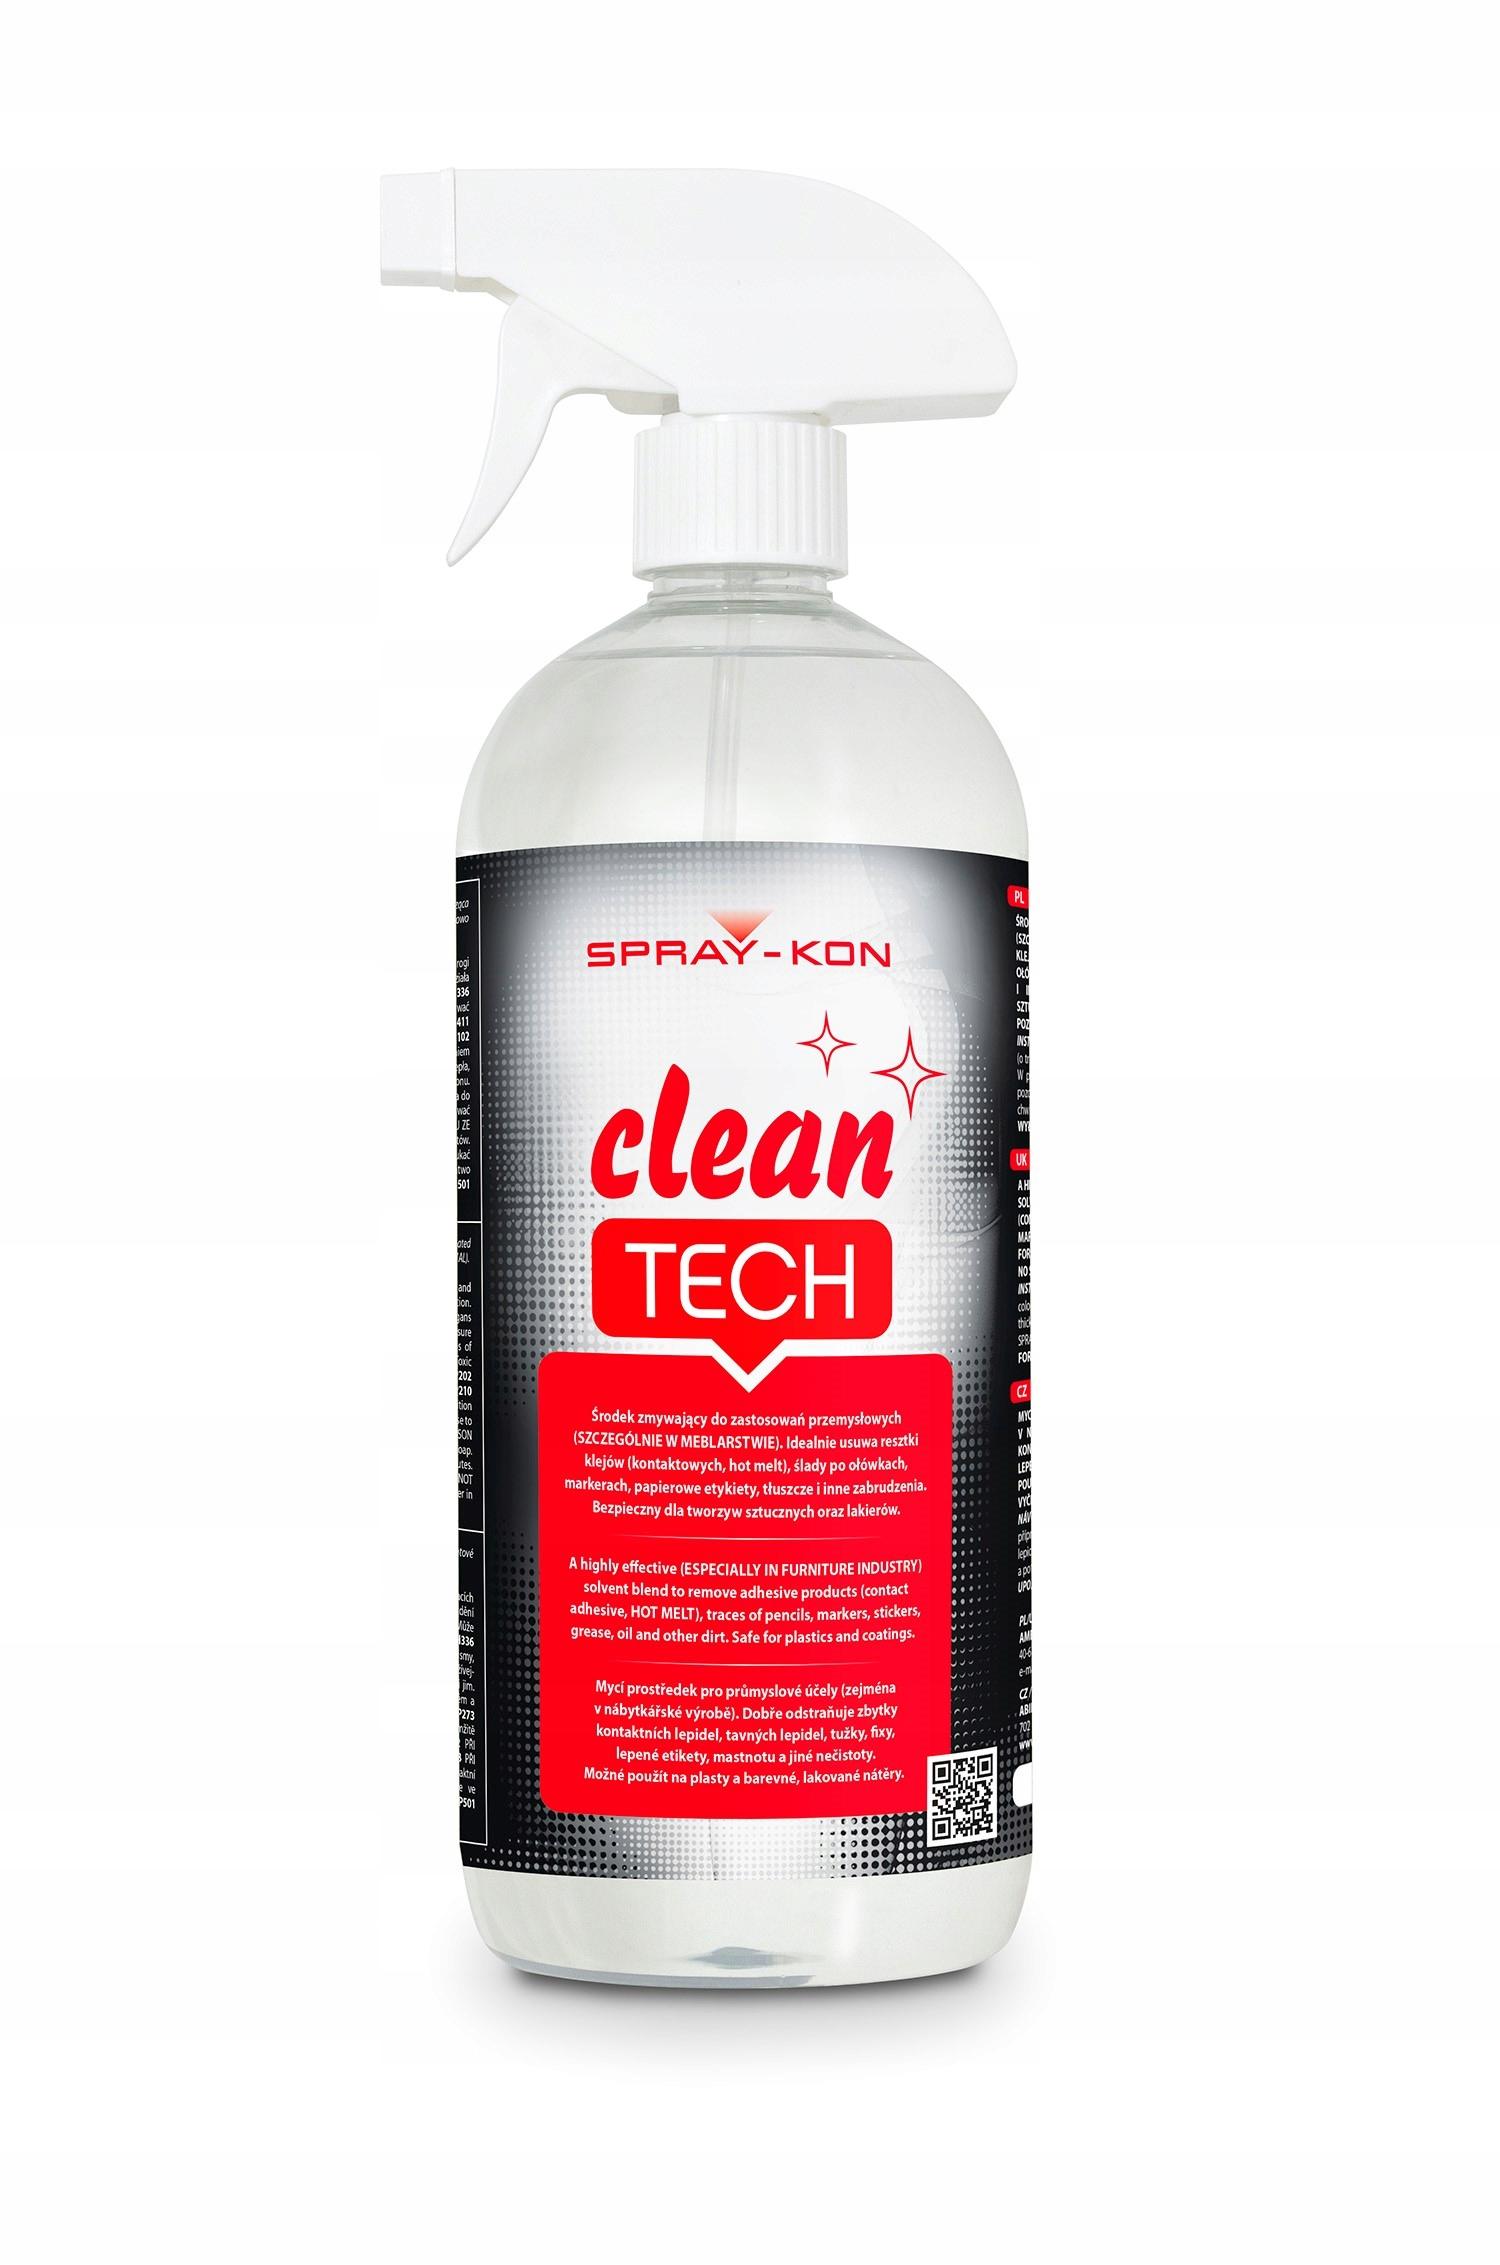 CLEAN TECH SPRAY KON обезжиривает ПВХ-АБС-СТАЛЬ.